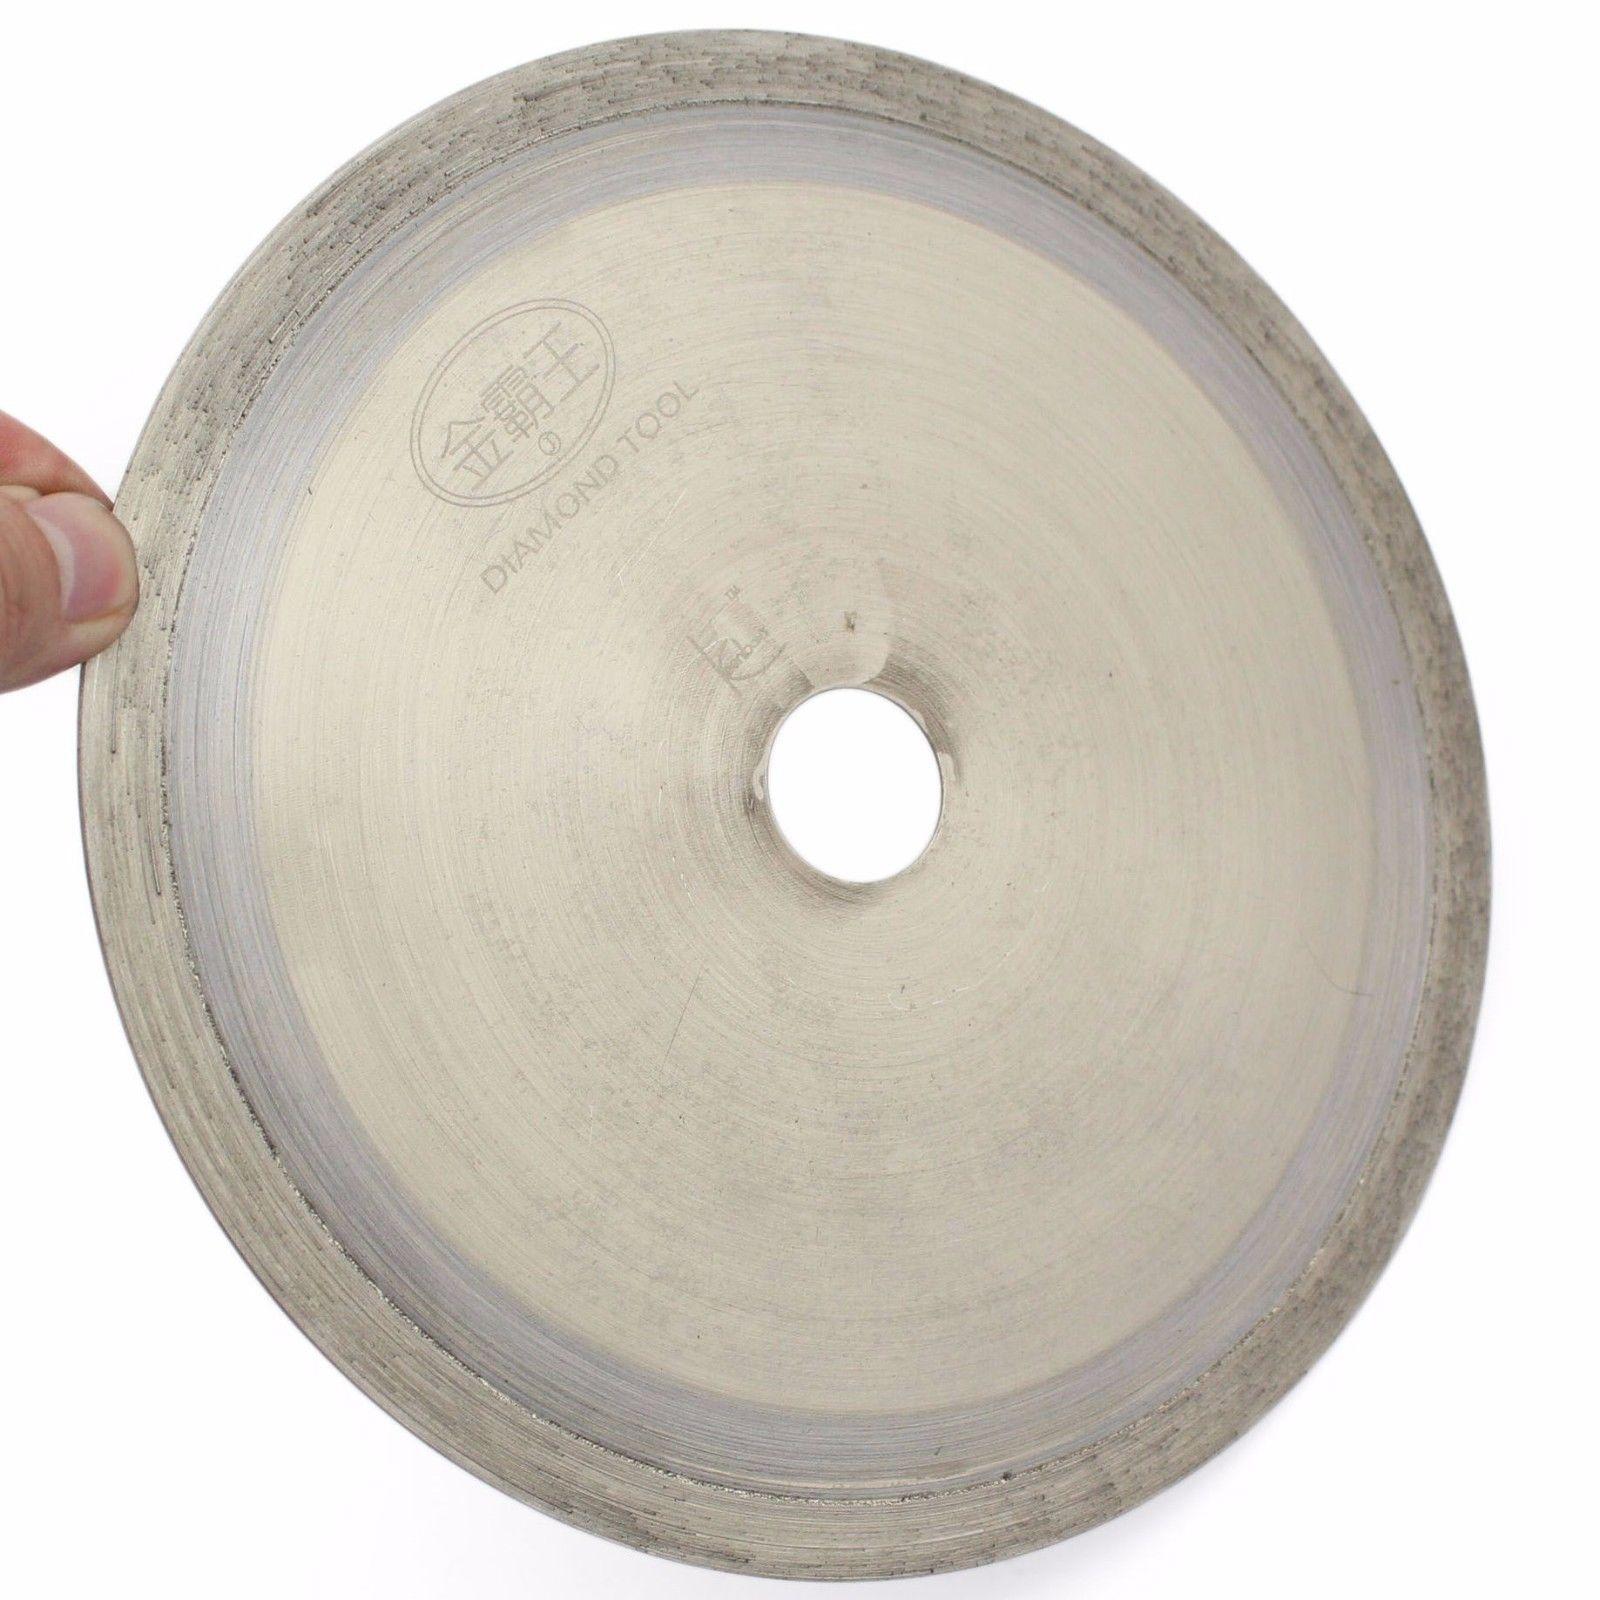 8 inch SINTERED Diamond Lapidary Saw Blade Tools Slab Trim Arbor 1-1/4 Gemstone ILOVETOOL 6 inch lapidary concave arc diamond coated grinding wheel grind spherical 6 mm ilovetool